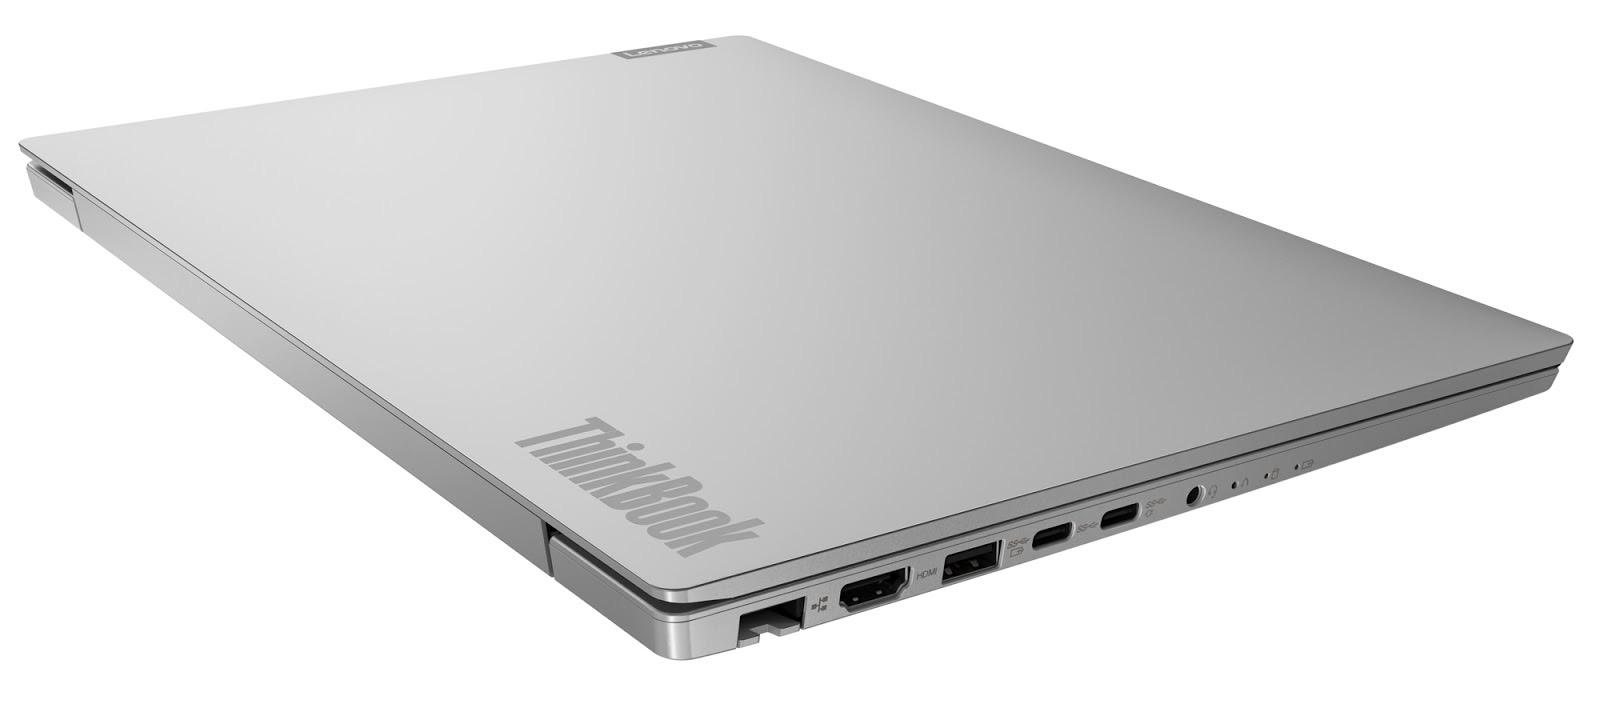 Фото 3. Ноутбук Lenovo ThinkBook 14 IIL (20SL00P1RU)